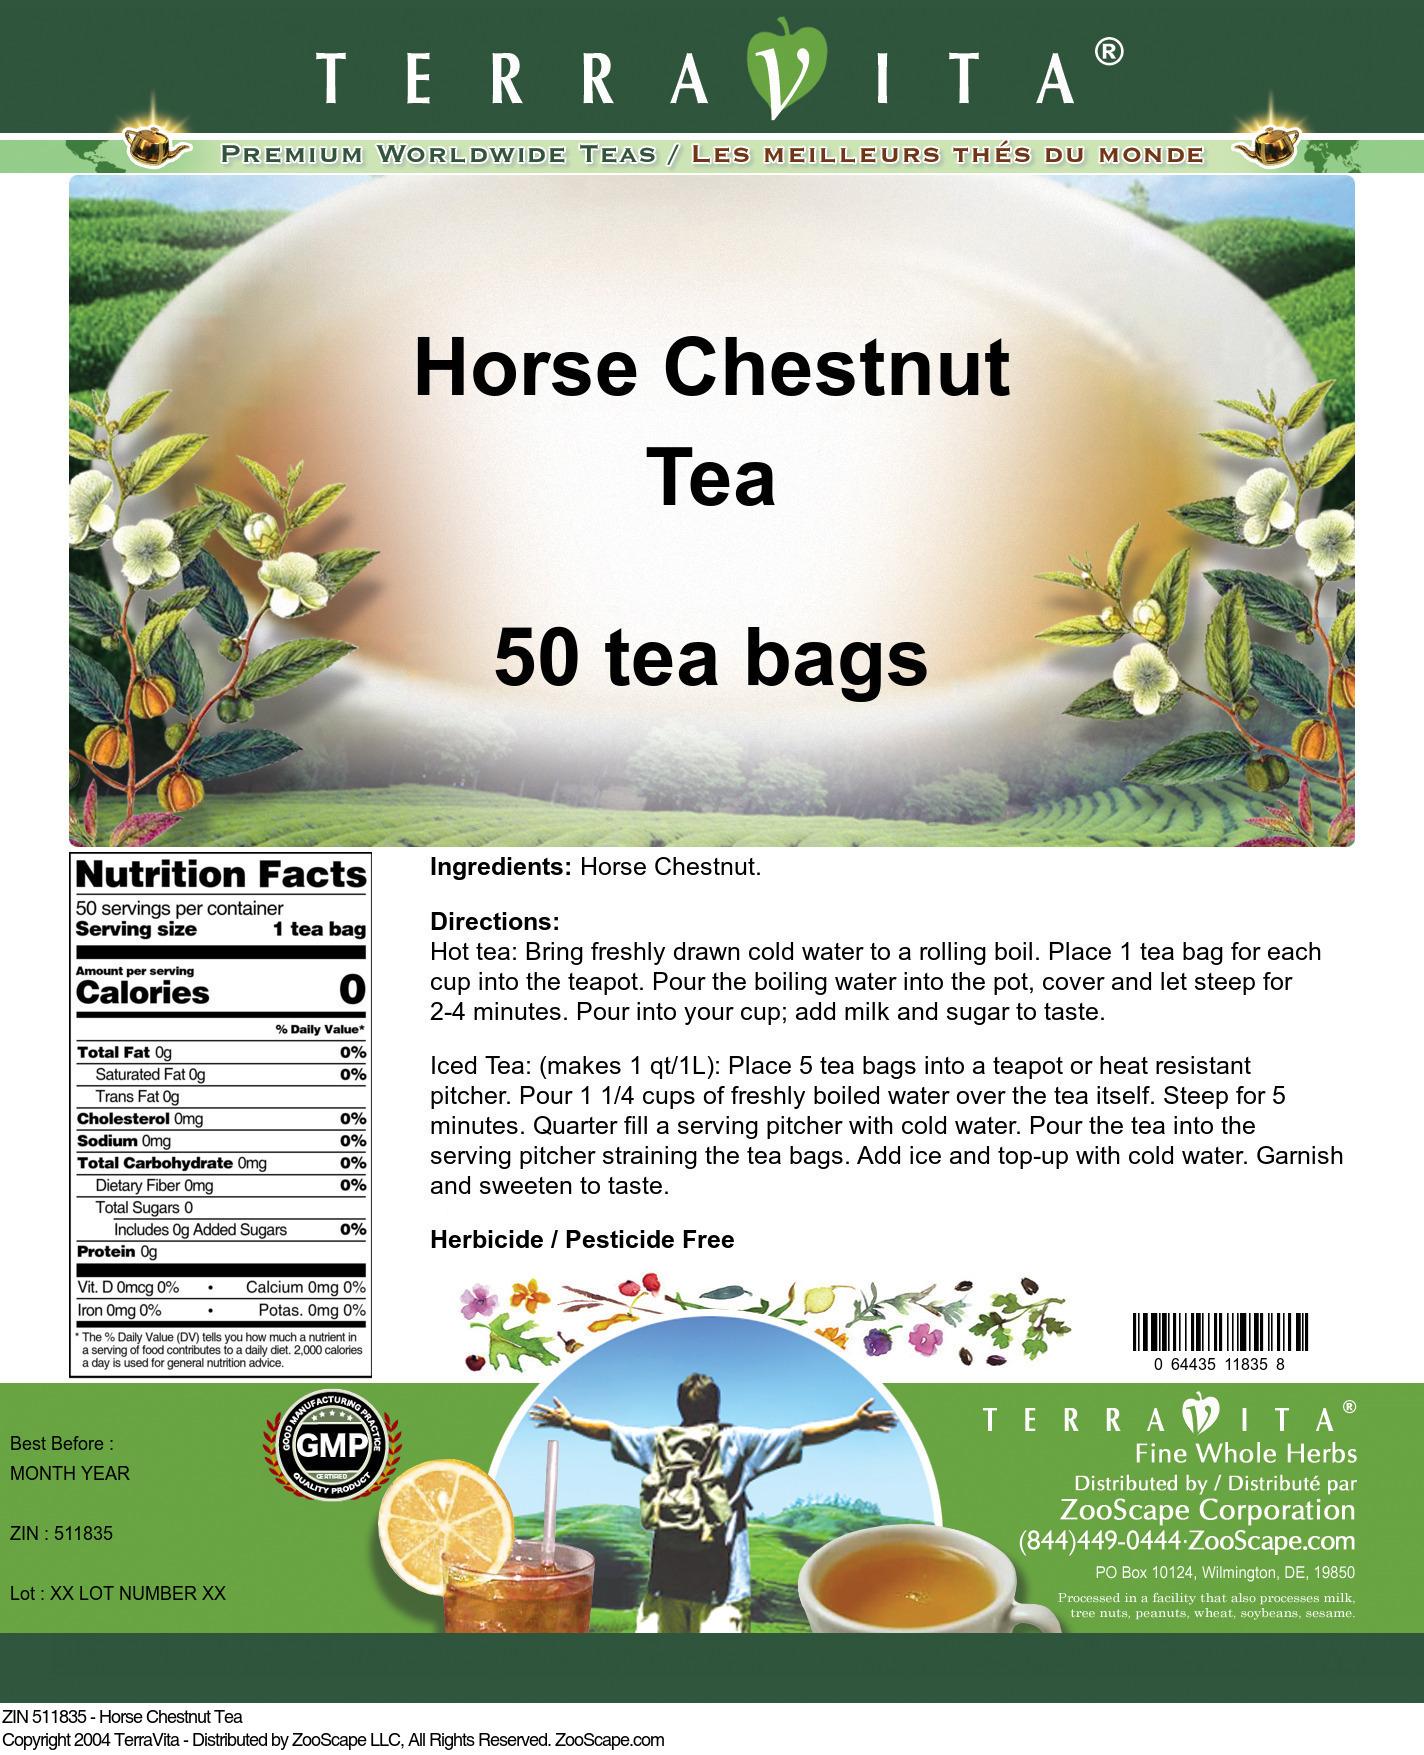 Horse Chestnut Tea